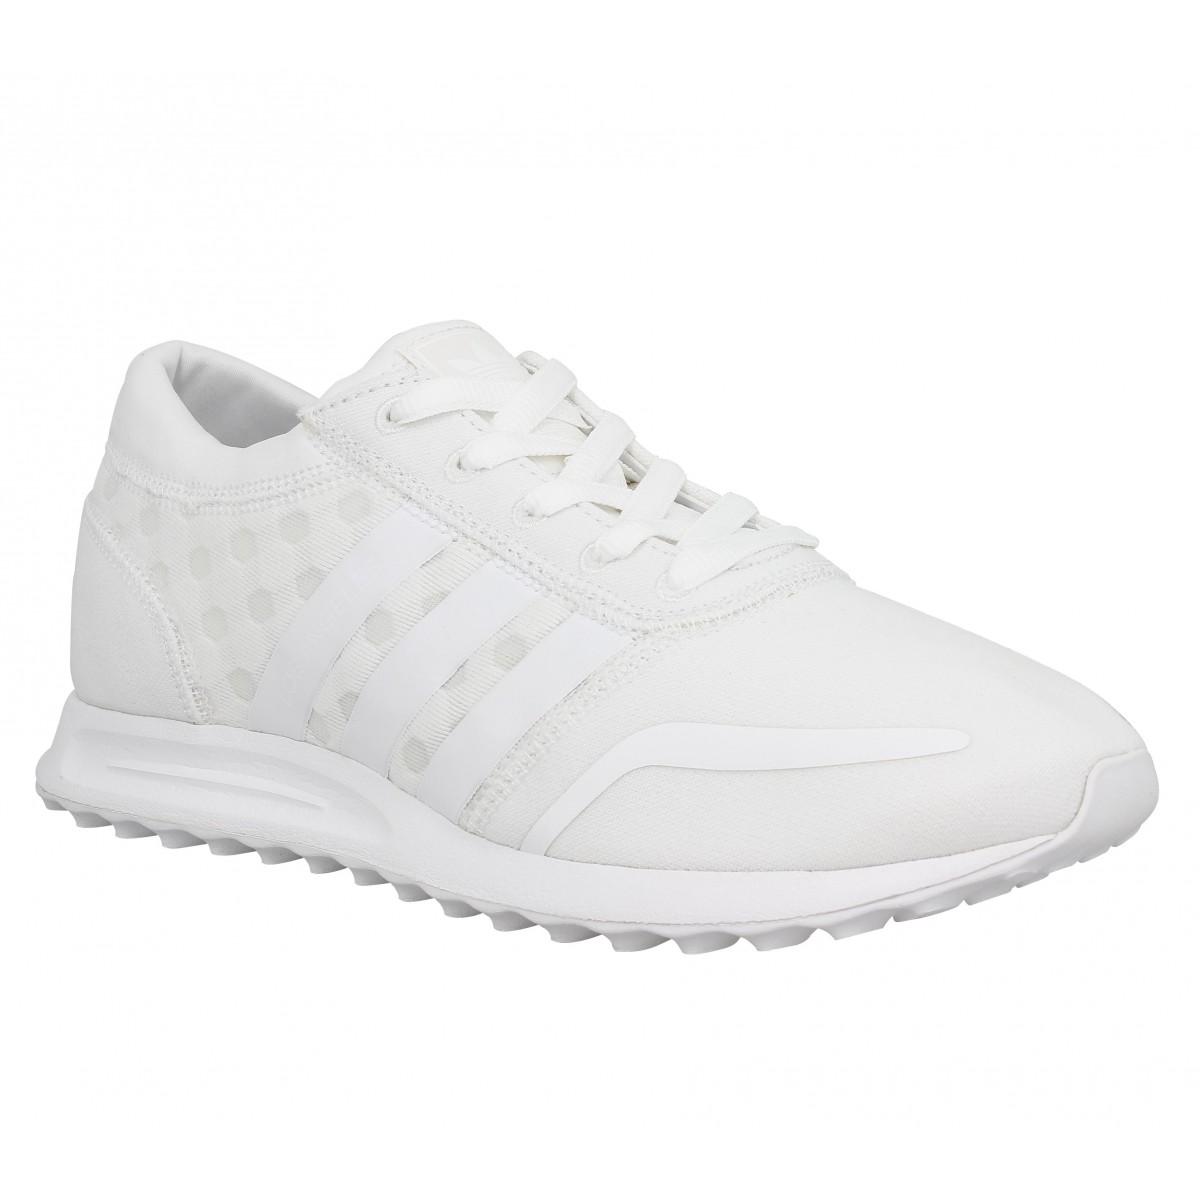 Adidas Femme Los Angeles Pois-36-blanc